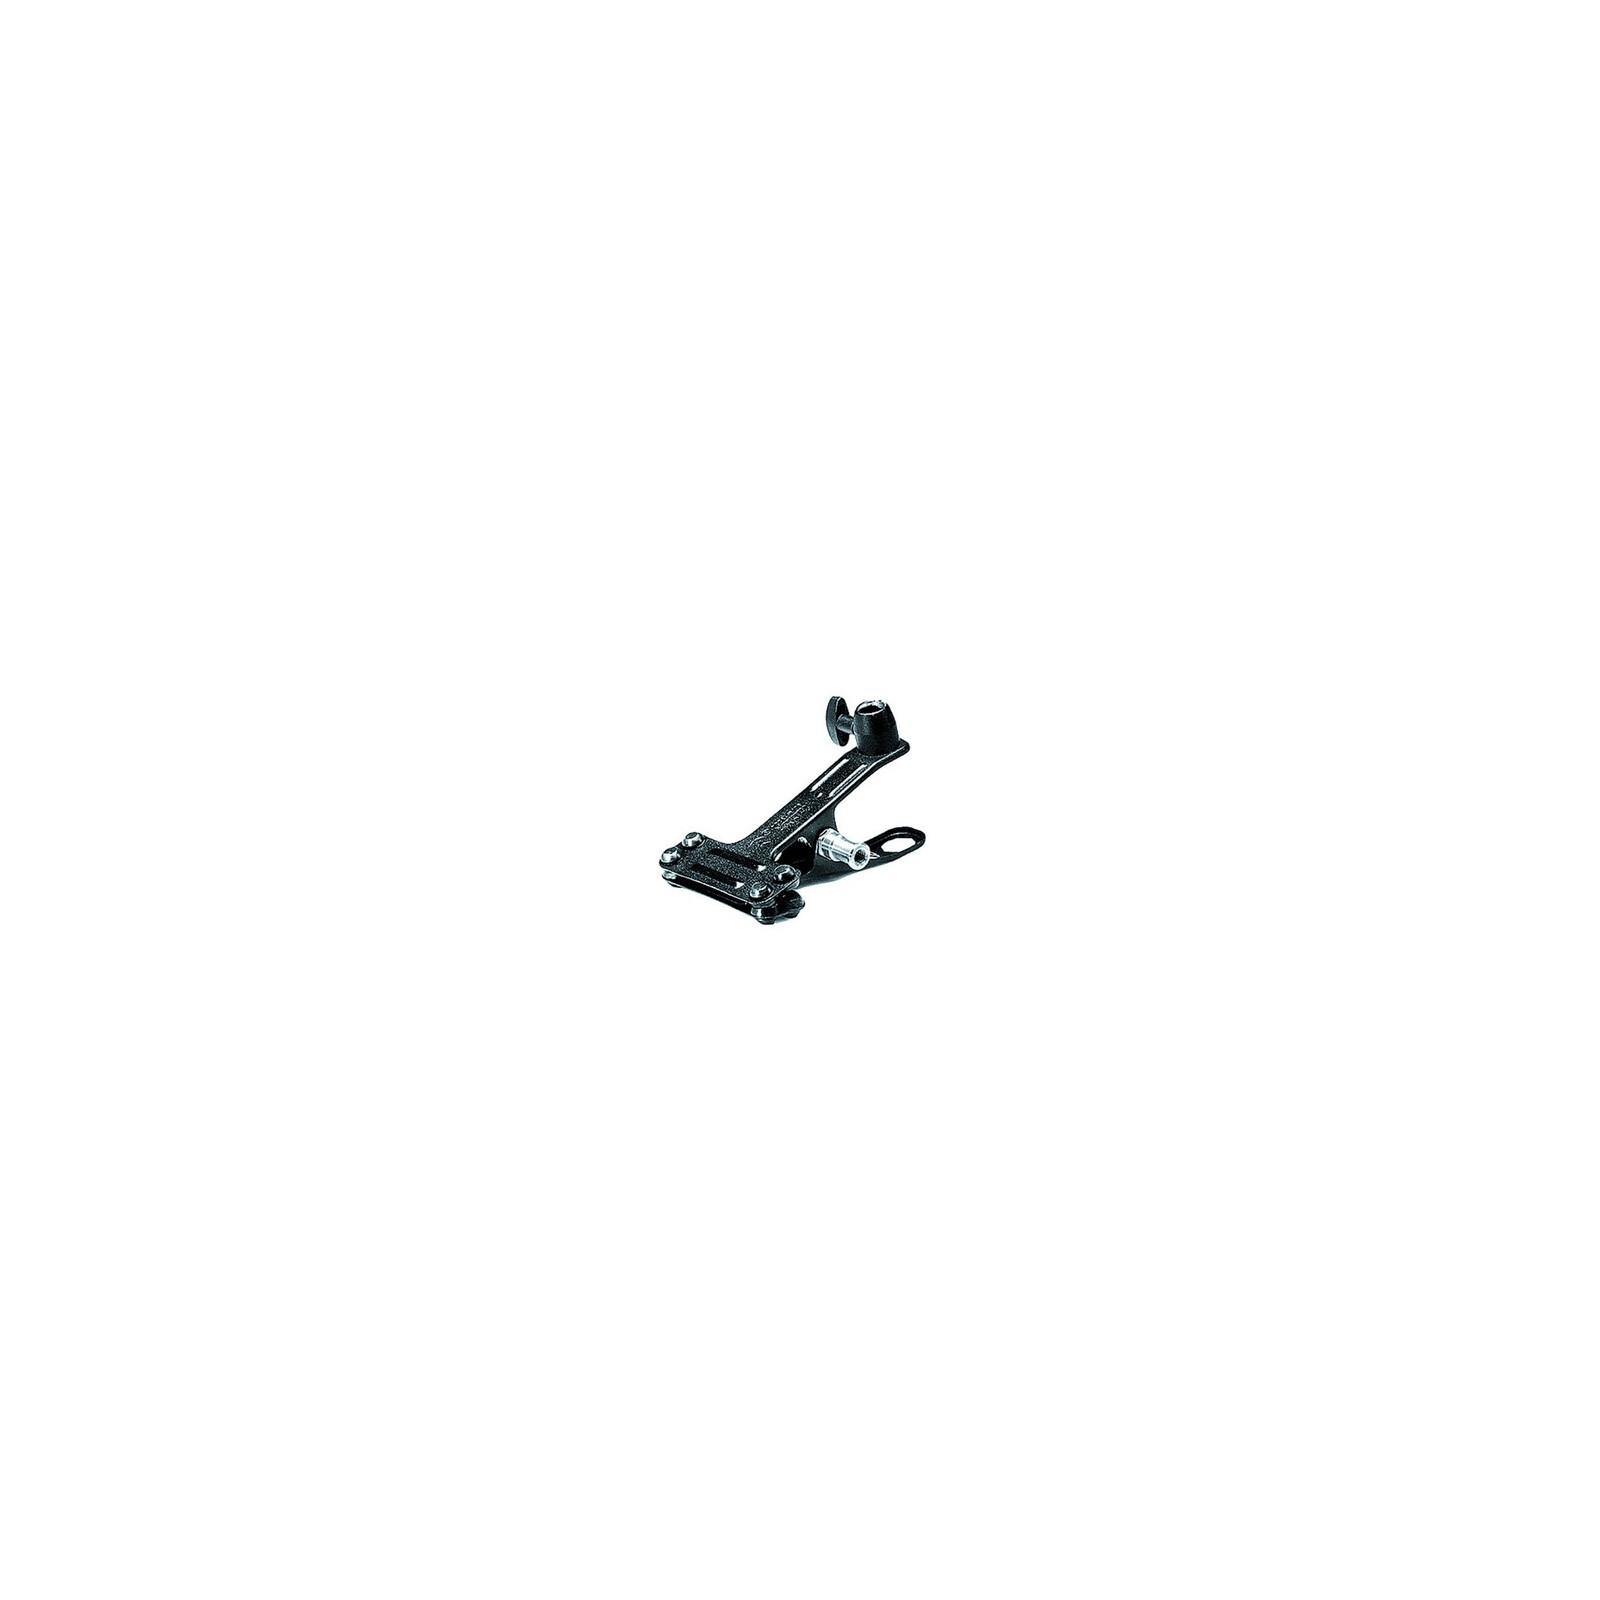 Manfrotto 275 Federklemme Mini 16mm Hülse